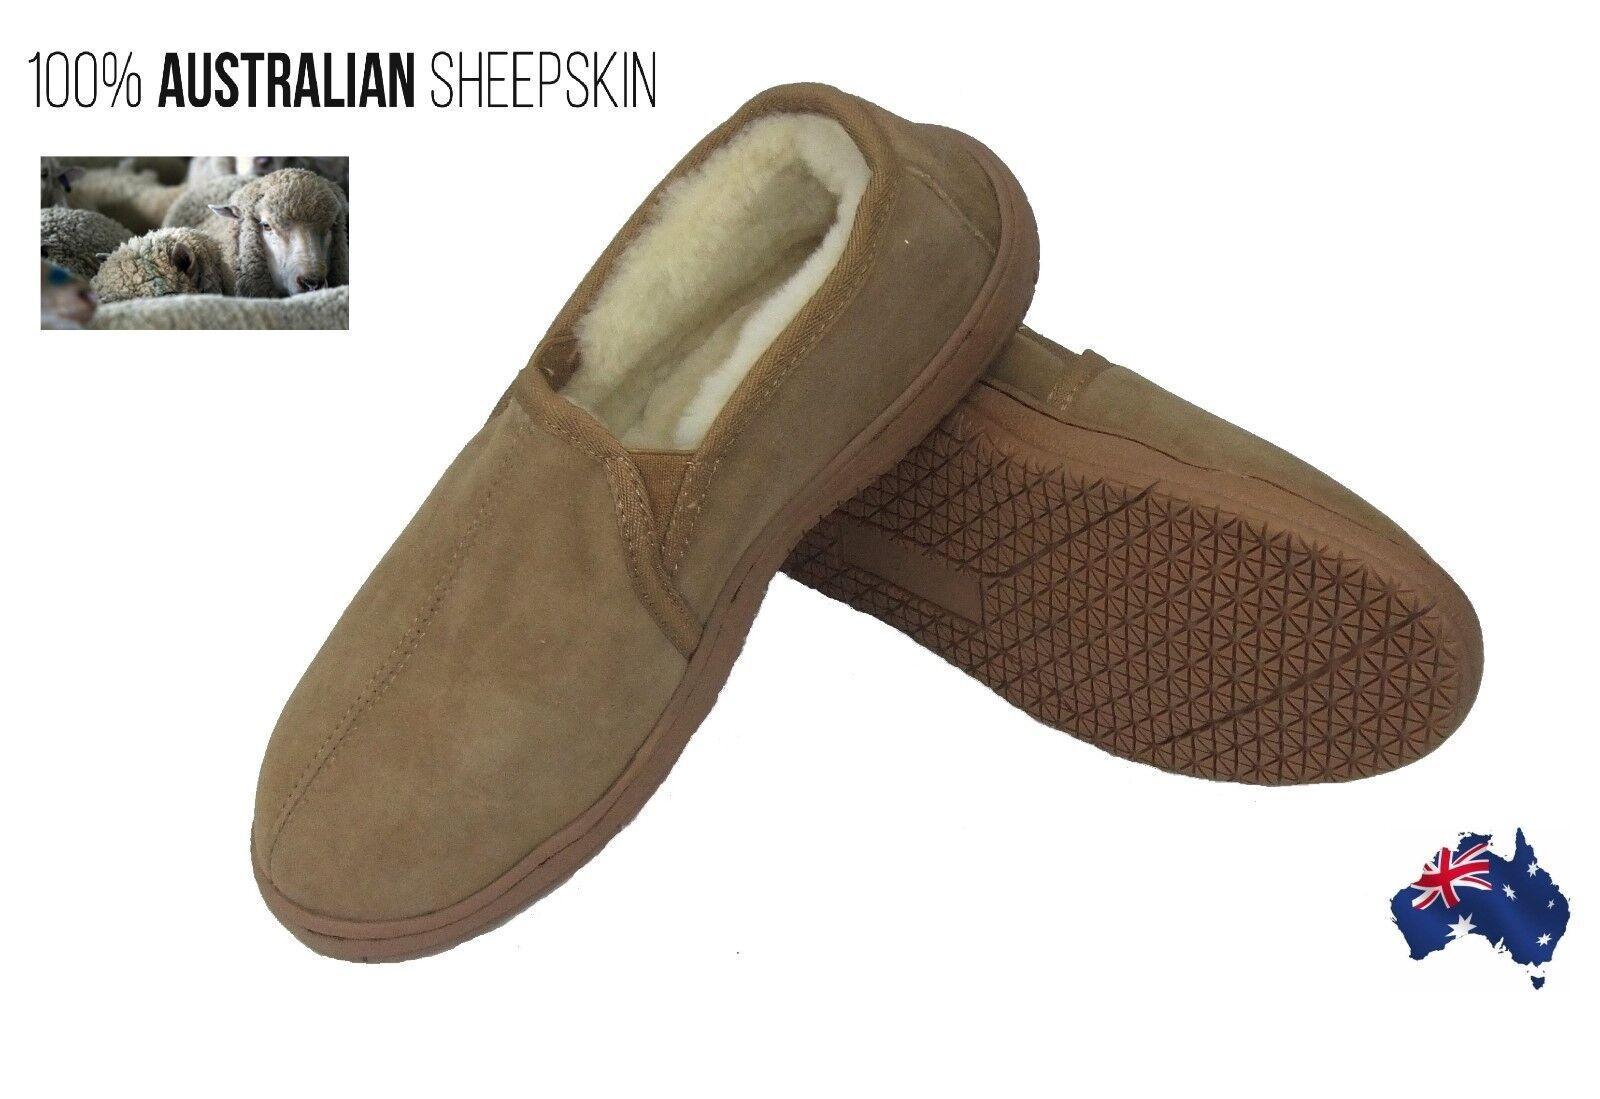 Mens Sheepskin Slippers Moulded Sole Chestnut  Brown Slipper Indoor Outdoor shoes